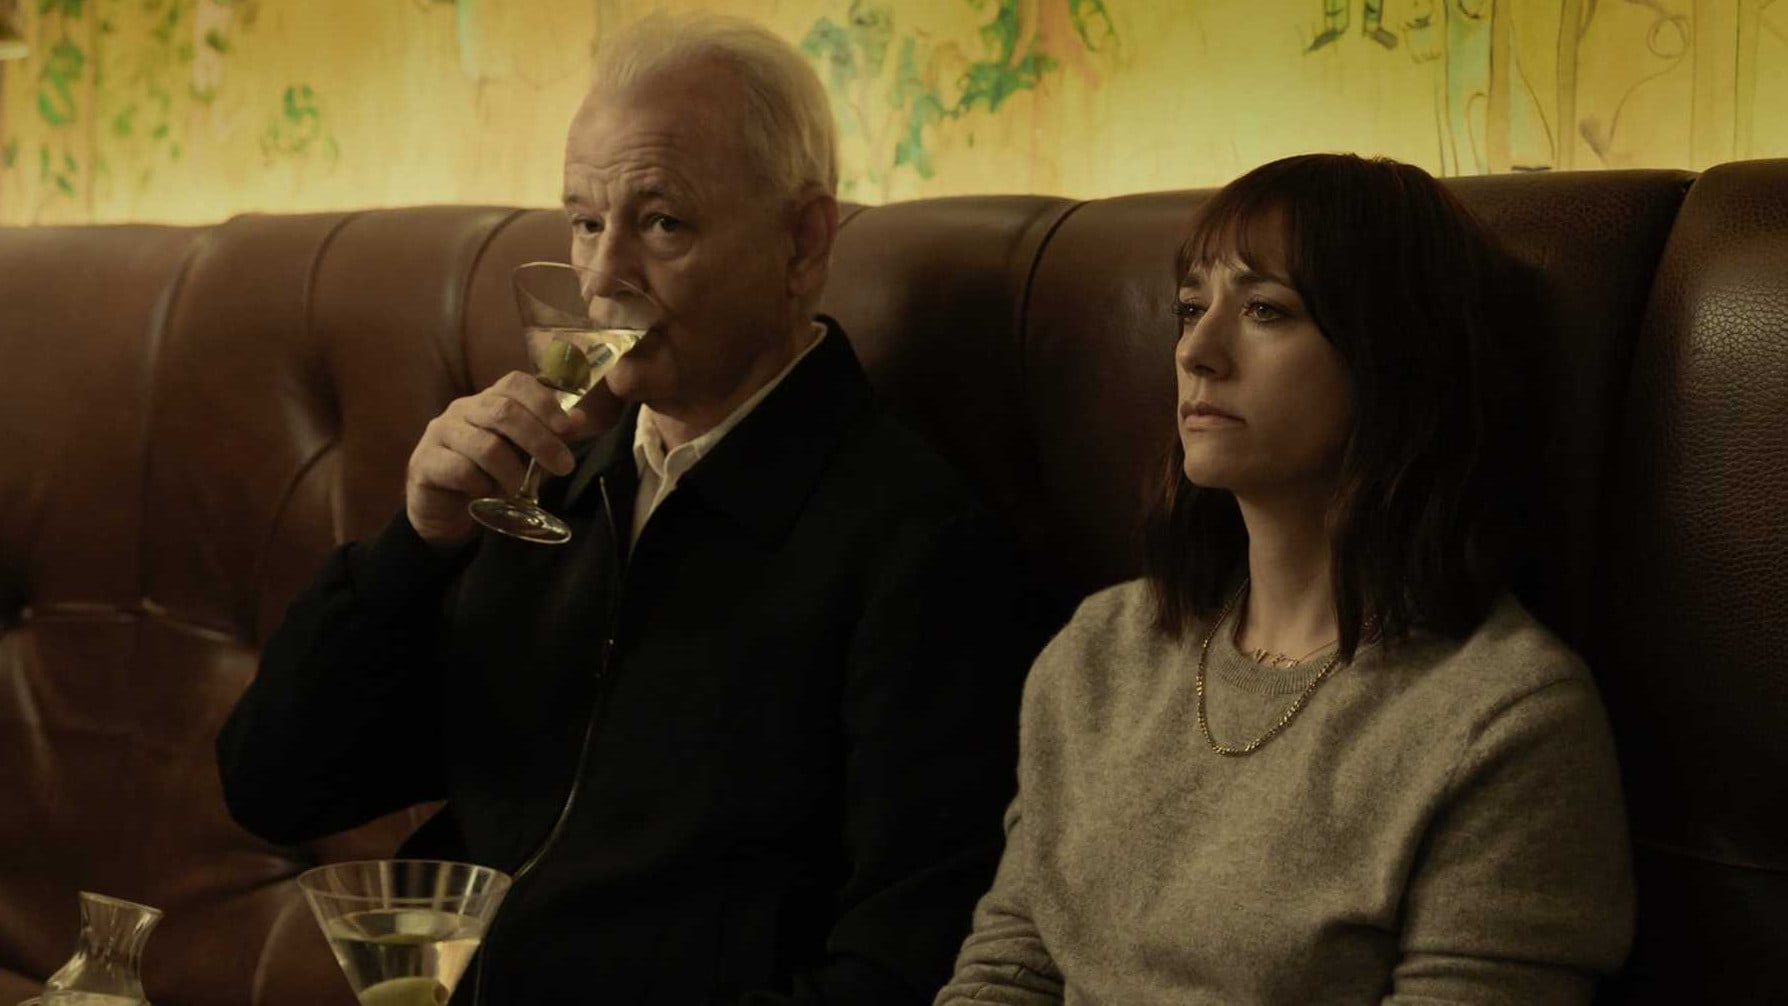 Bill Murray et Rashida Jones boivent un cocktail dans On The Rocks